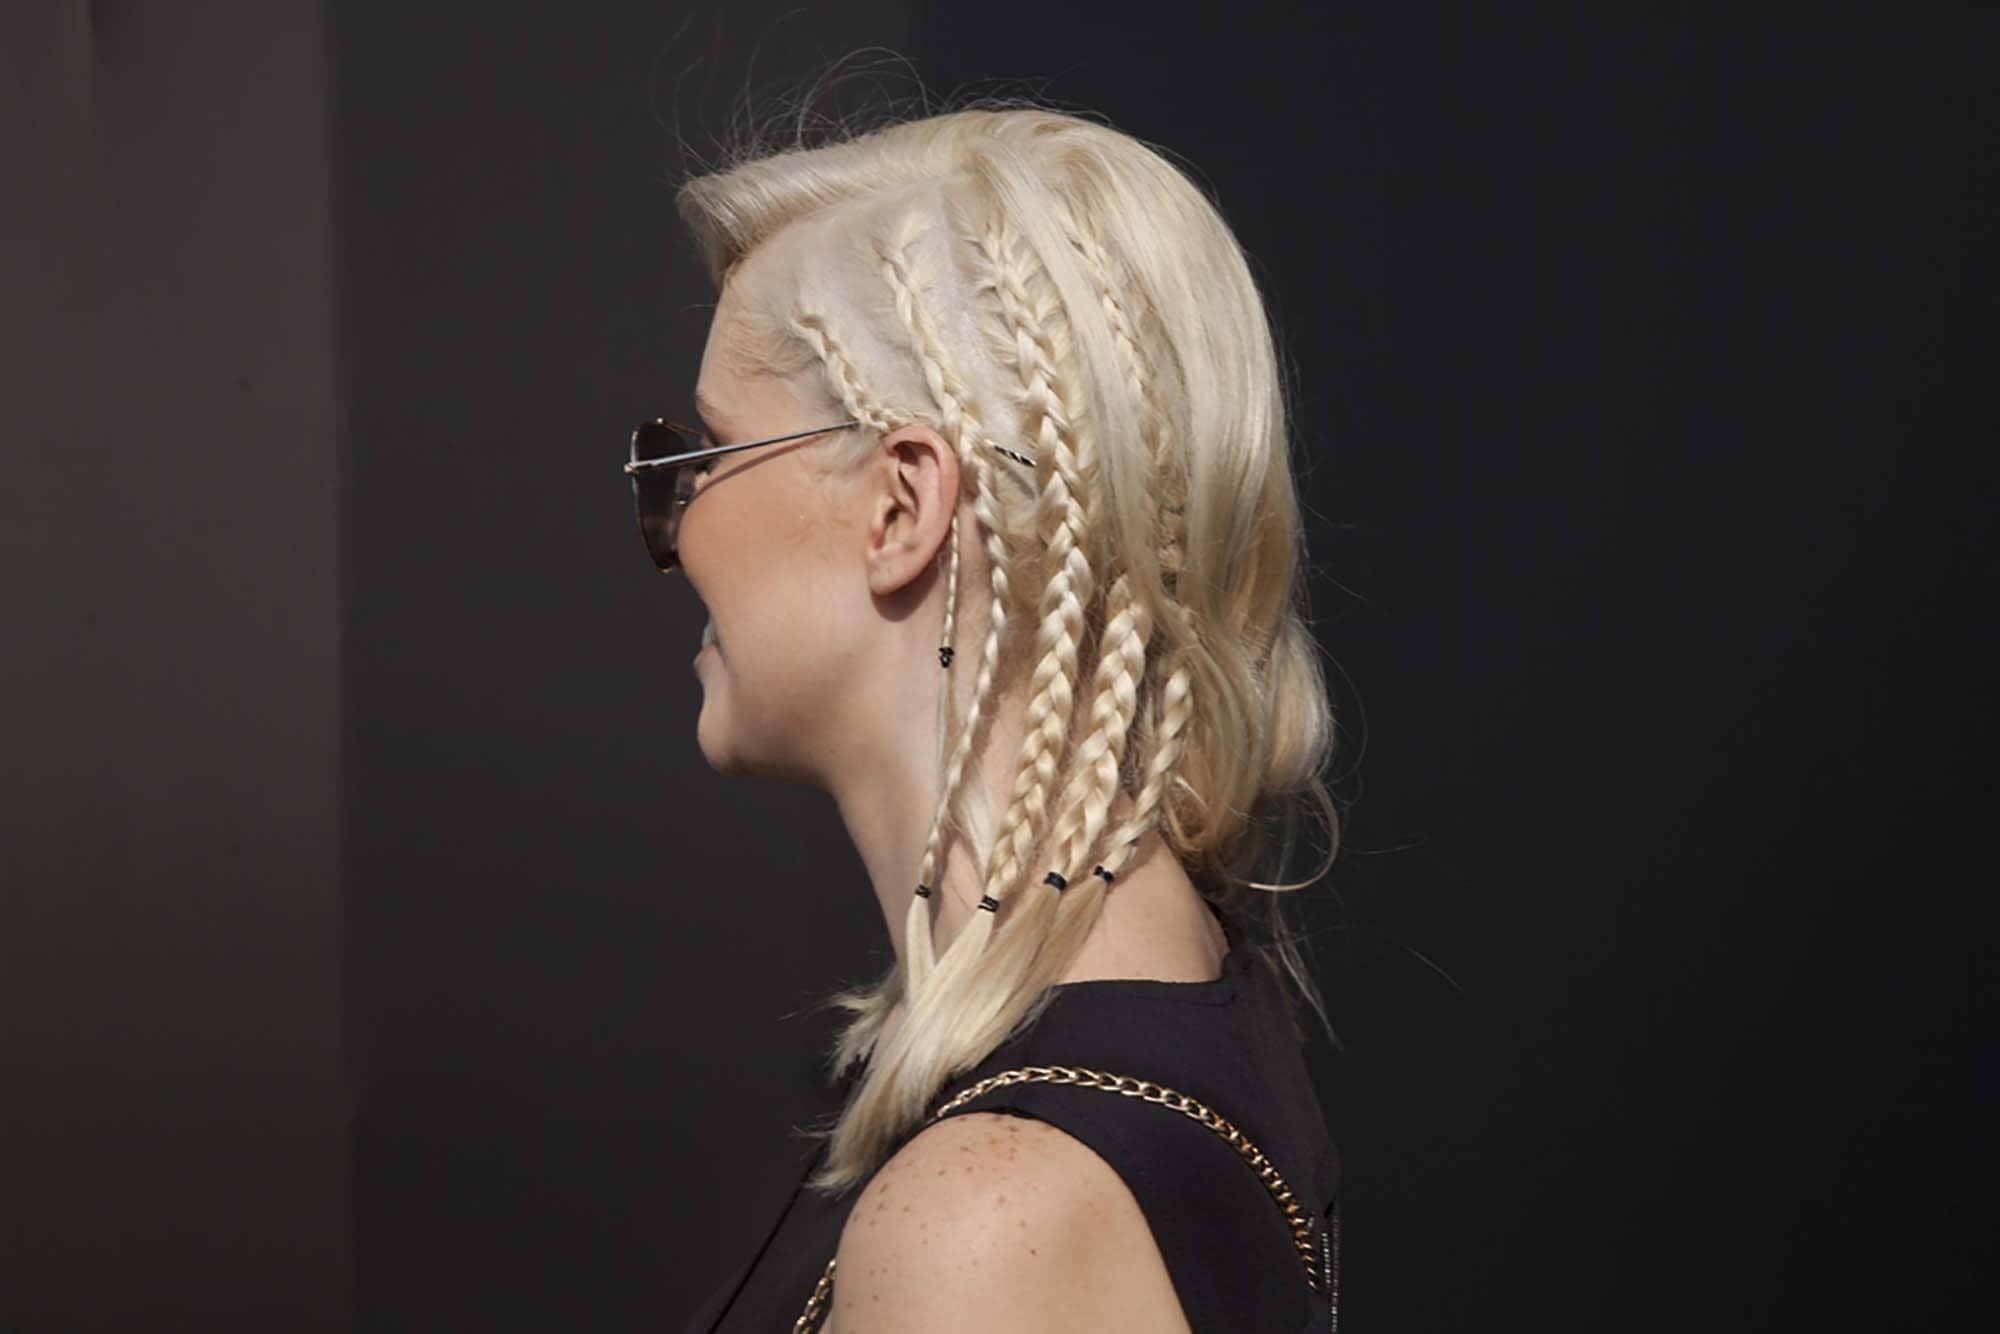 bleached hair small braids hairstyle